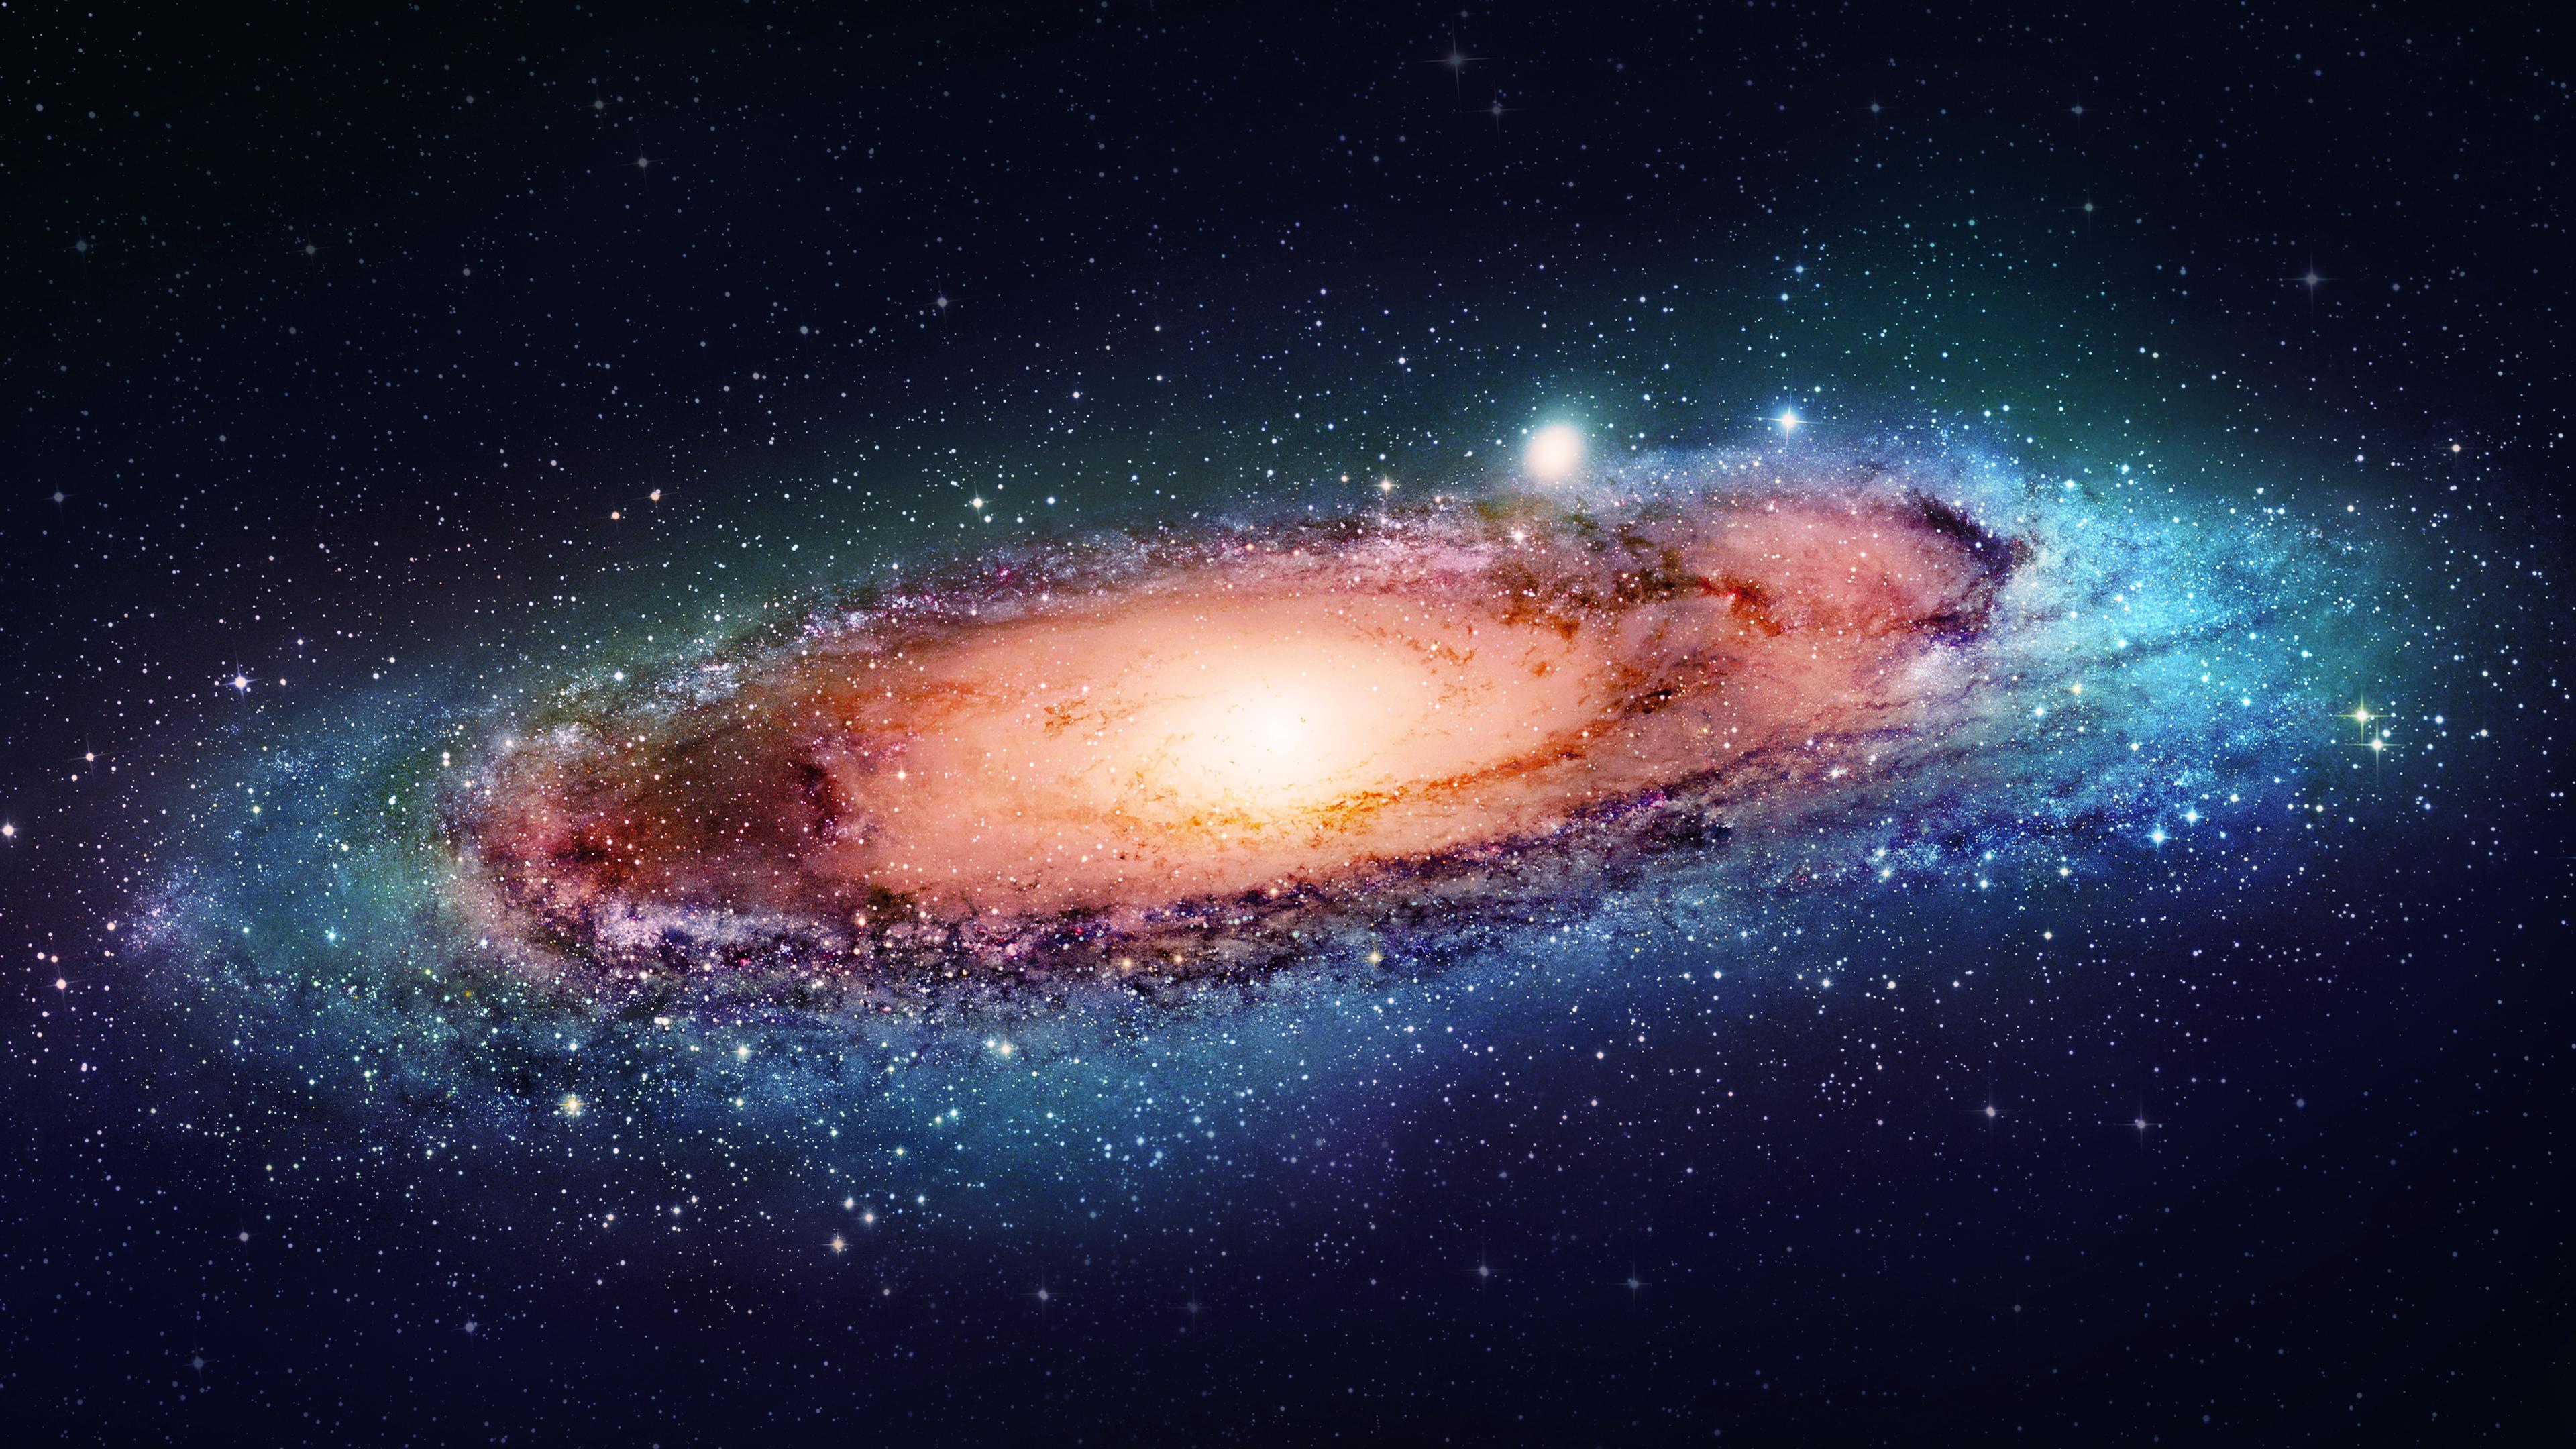 Free Download Galaxy Lightyears Space 4k Wallpaper 4k Wallpaper Ultra Hd Wallpaper 3840x2160 For Your Desktop Mobile Tablet Explore 46 4k Space Wallpaper Reddit 4k Space Wallpaper Reddit R